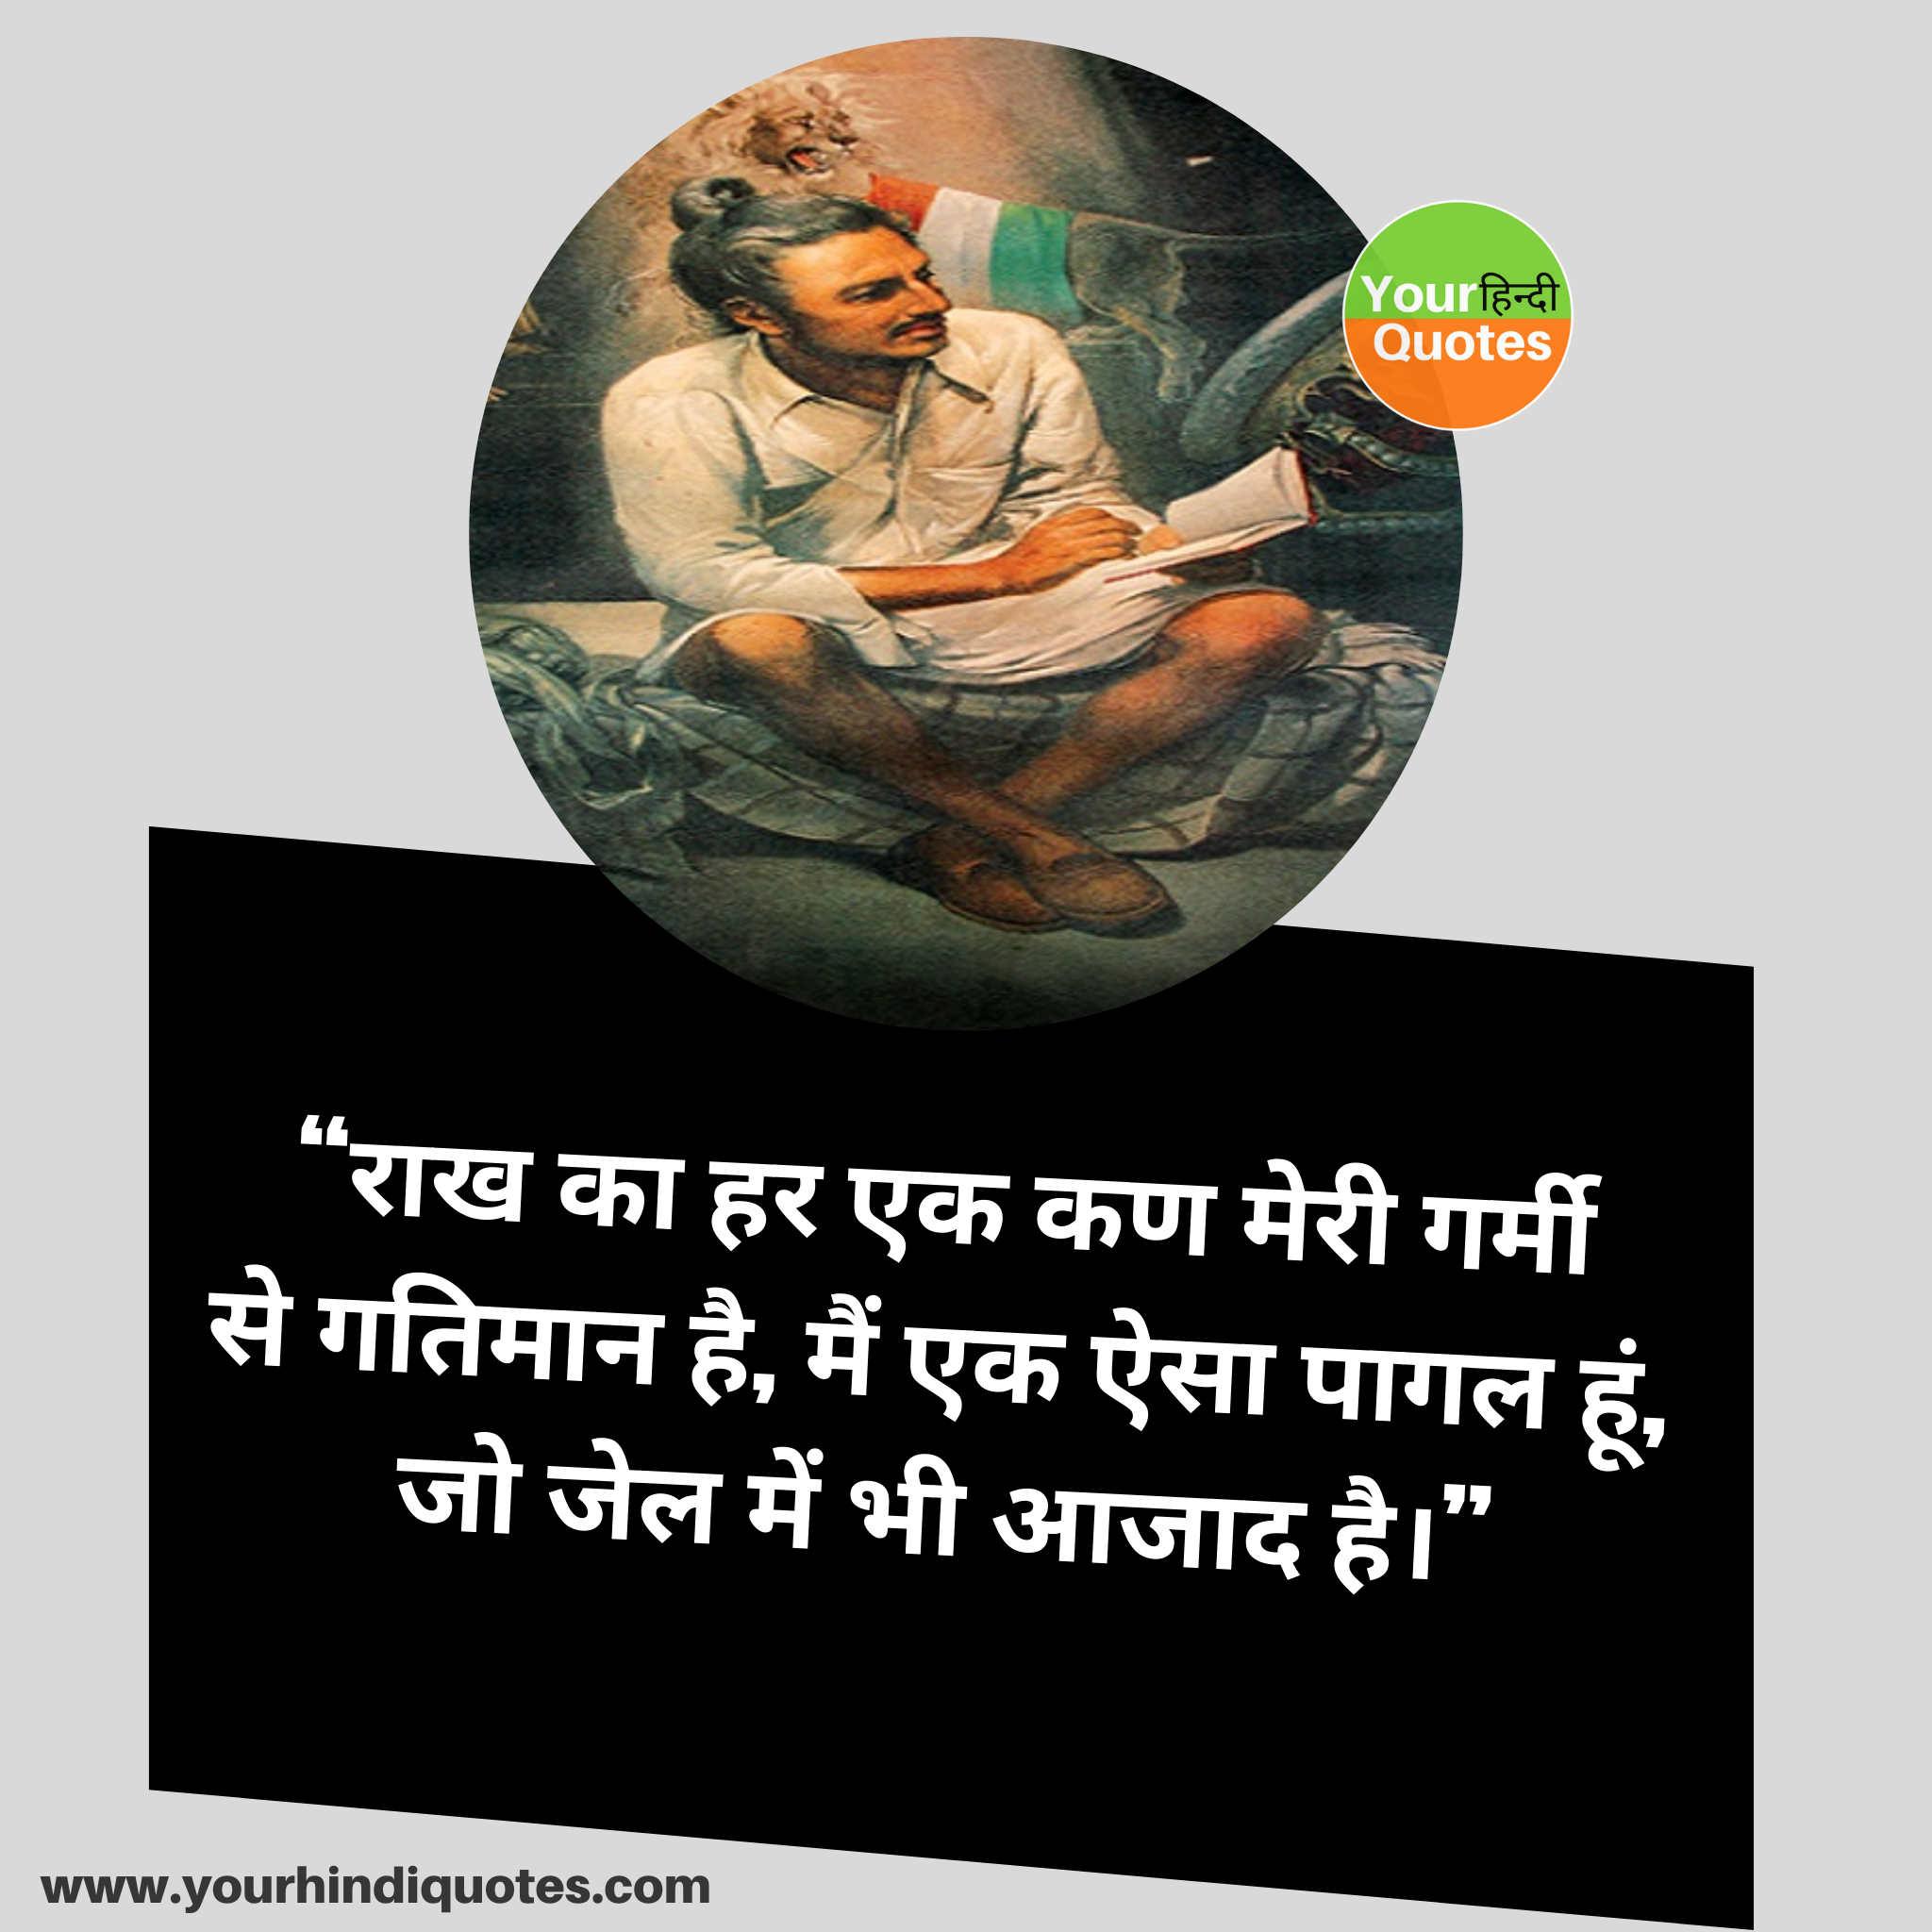 Bhagat Singh Hindi Quotes Images